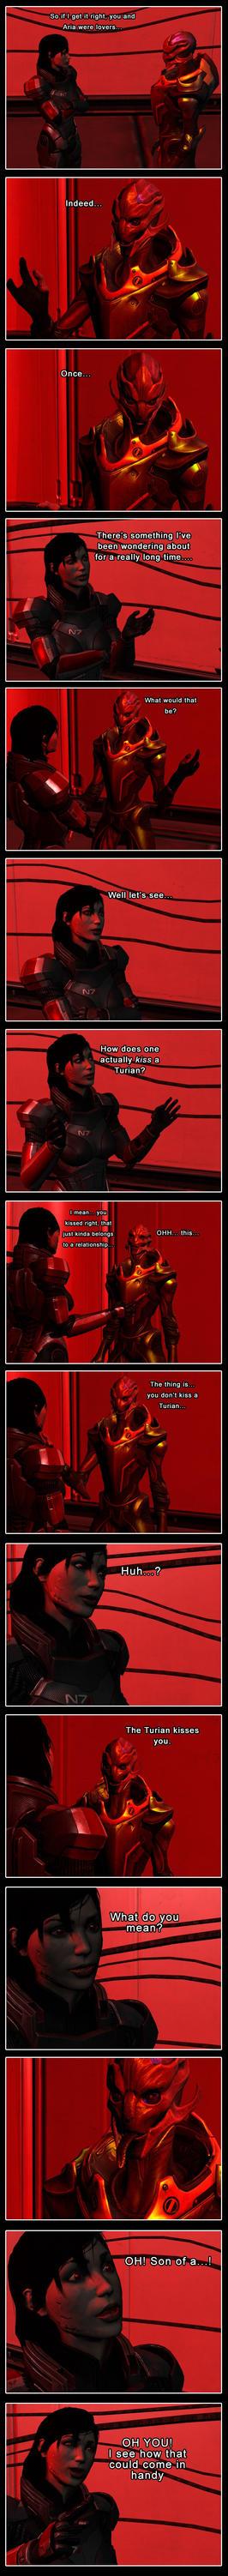 Mass Effect - Turian Kiss by Yuri-World-Ruler